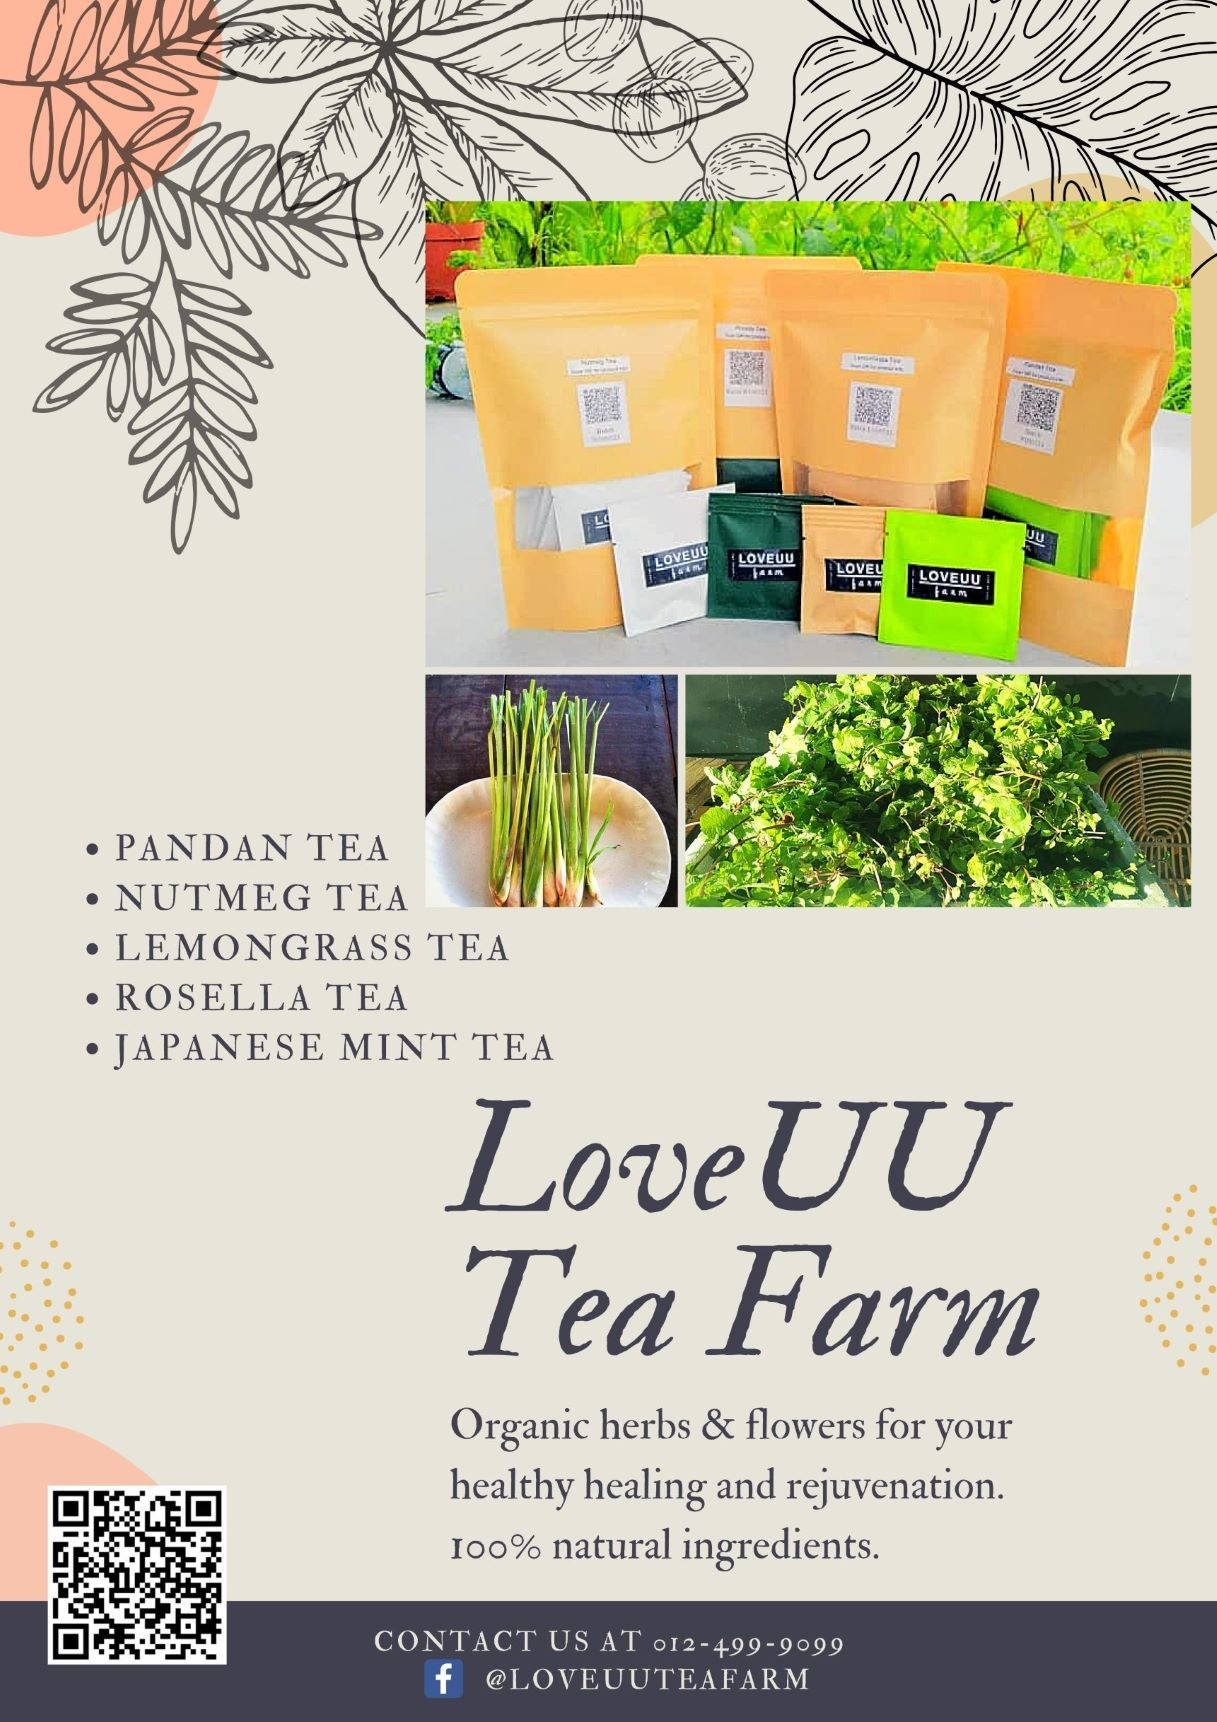 LoveUU Tea Farm